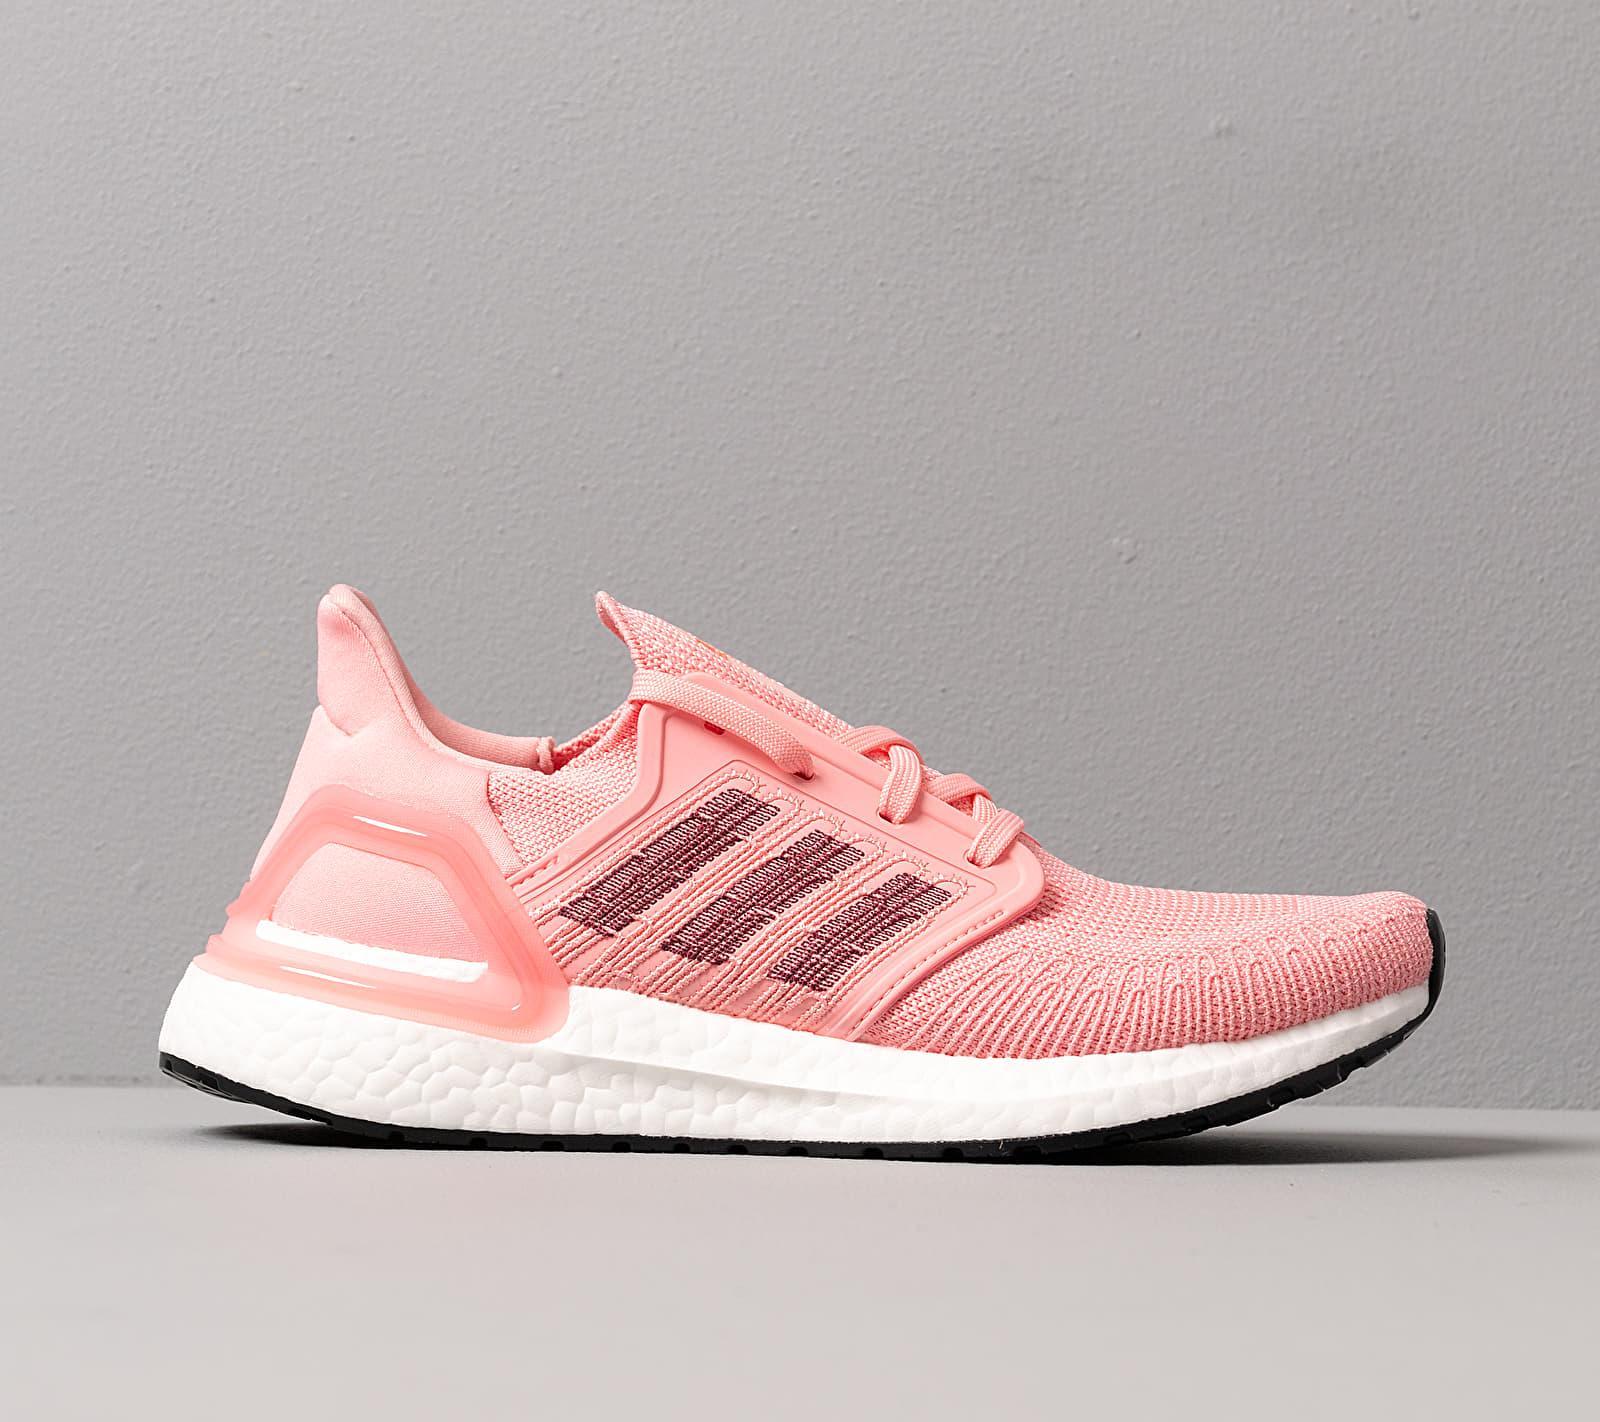 Adidas UltraBOOST 20 W Glow Pink/ Maroon/ Signature Coral adidas Originals